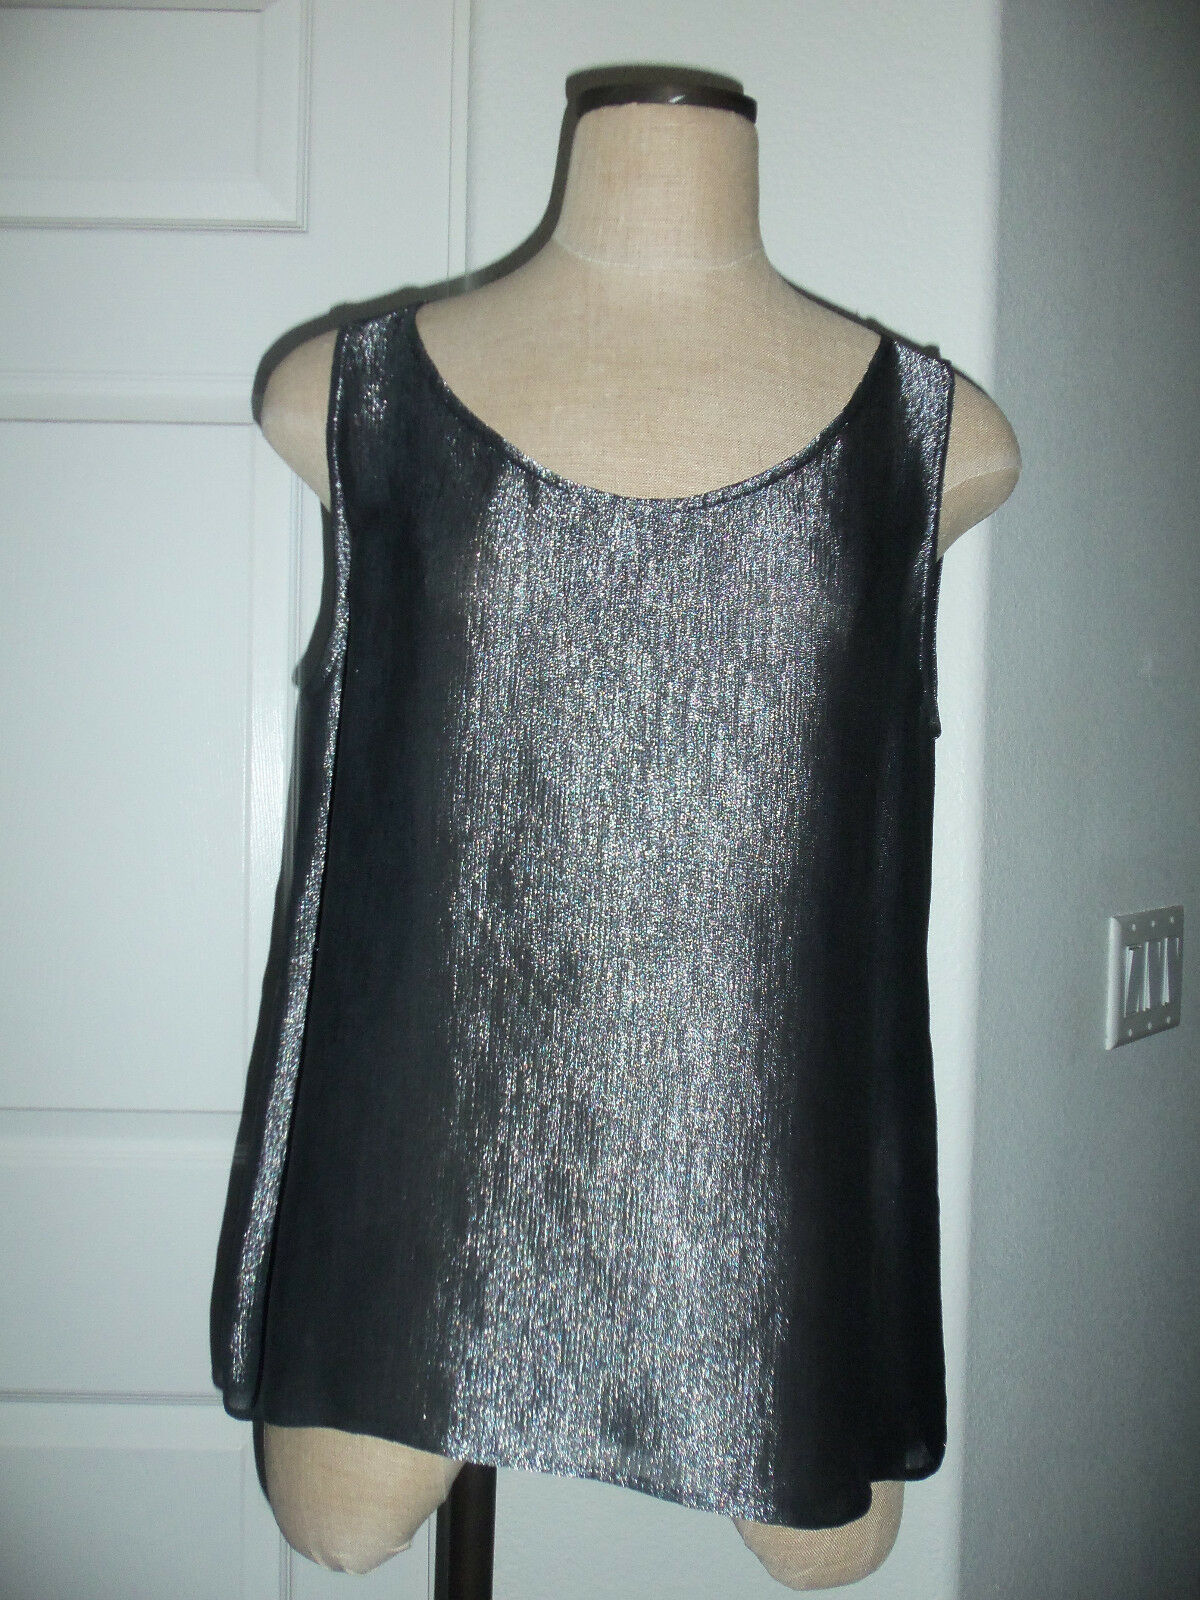 Giorgio Armani Collezioni Weiß Label Metallic grau Silk Blend Sleeveless Top 14